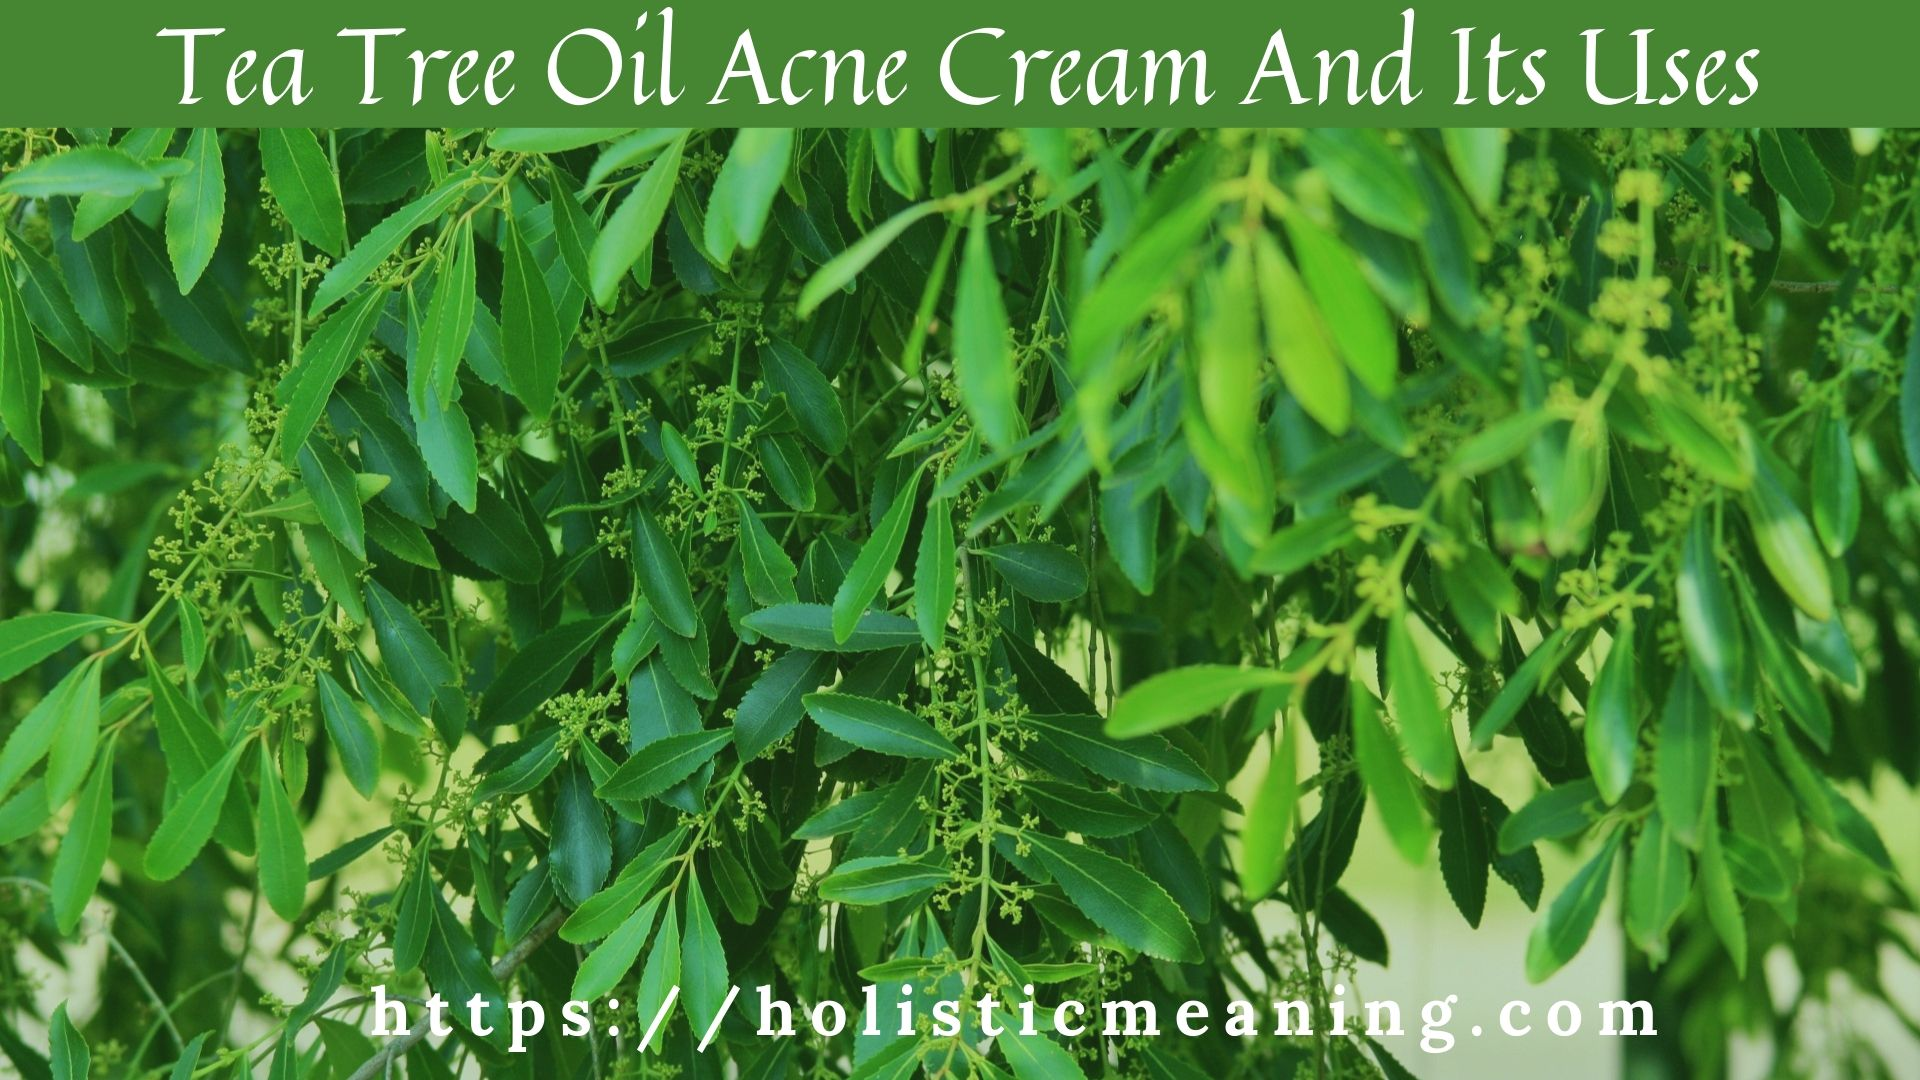 Tea Tree Oil Acne Cream And Its Uses